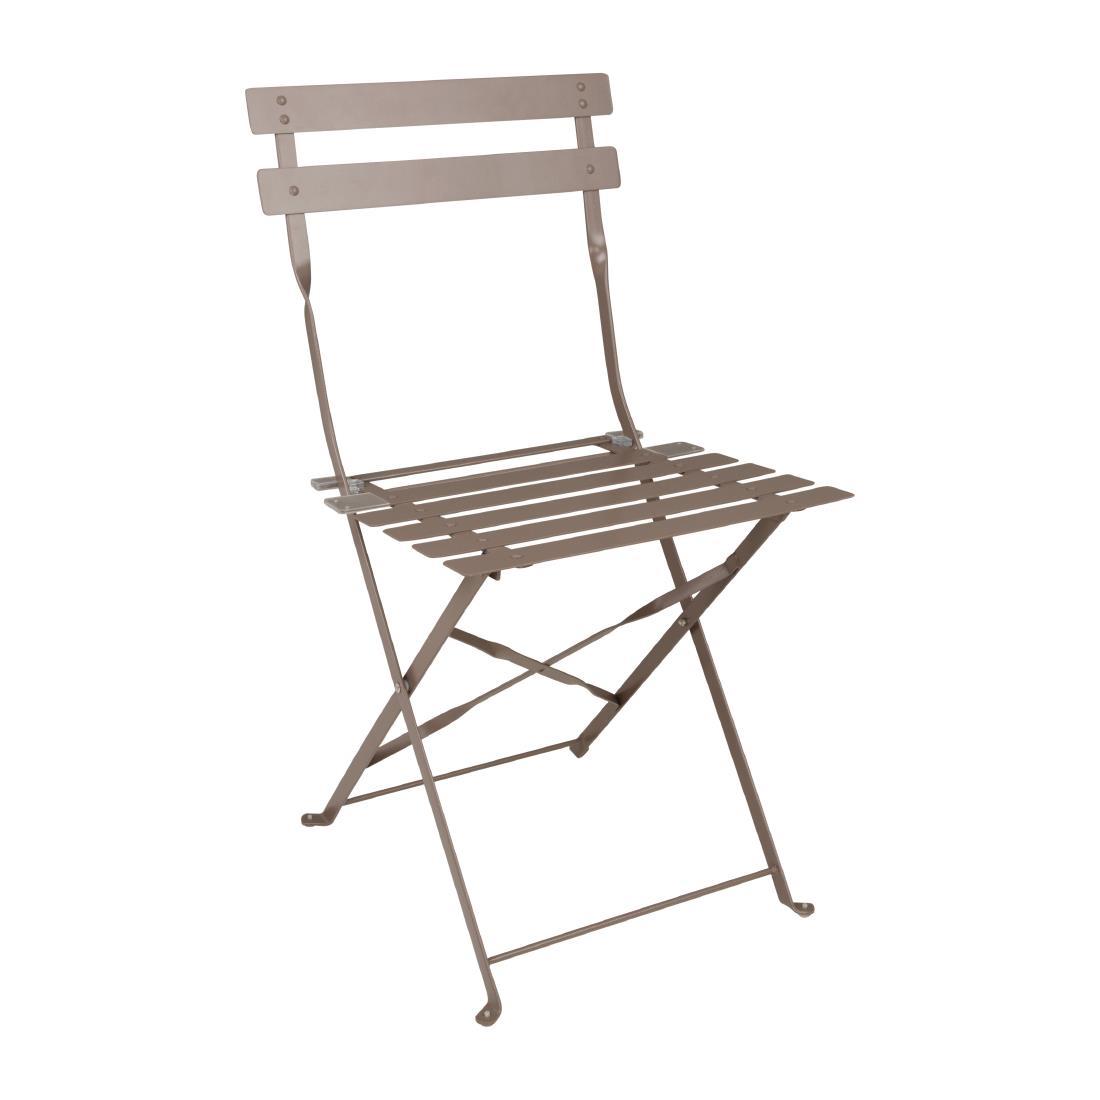 Steel Folding Chair - Coffee